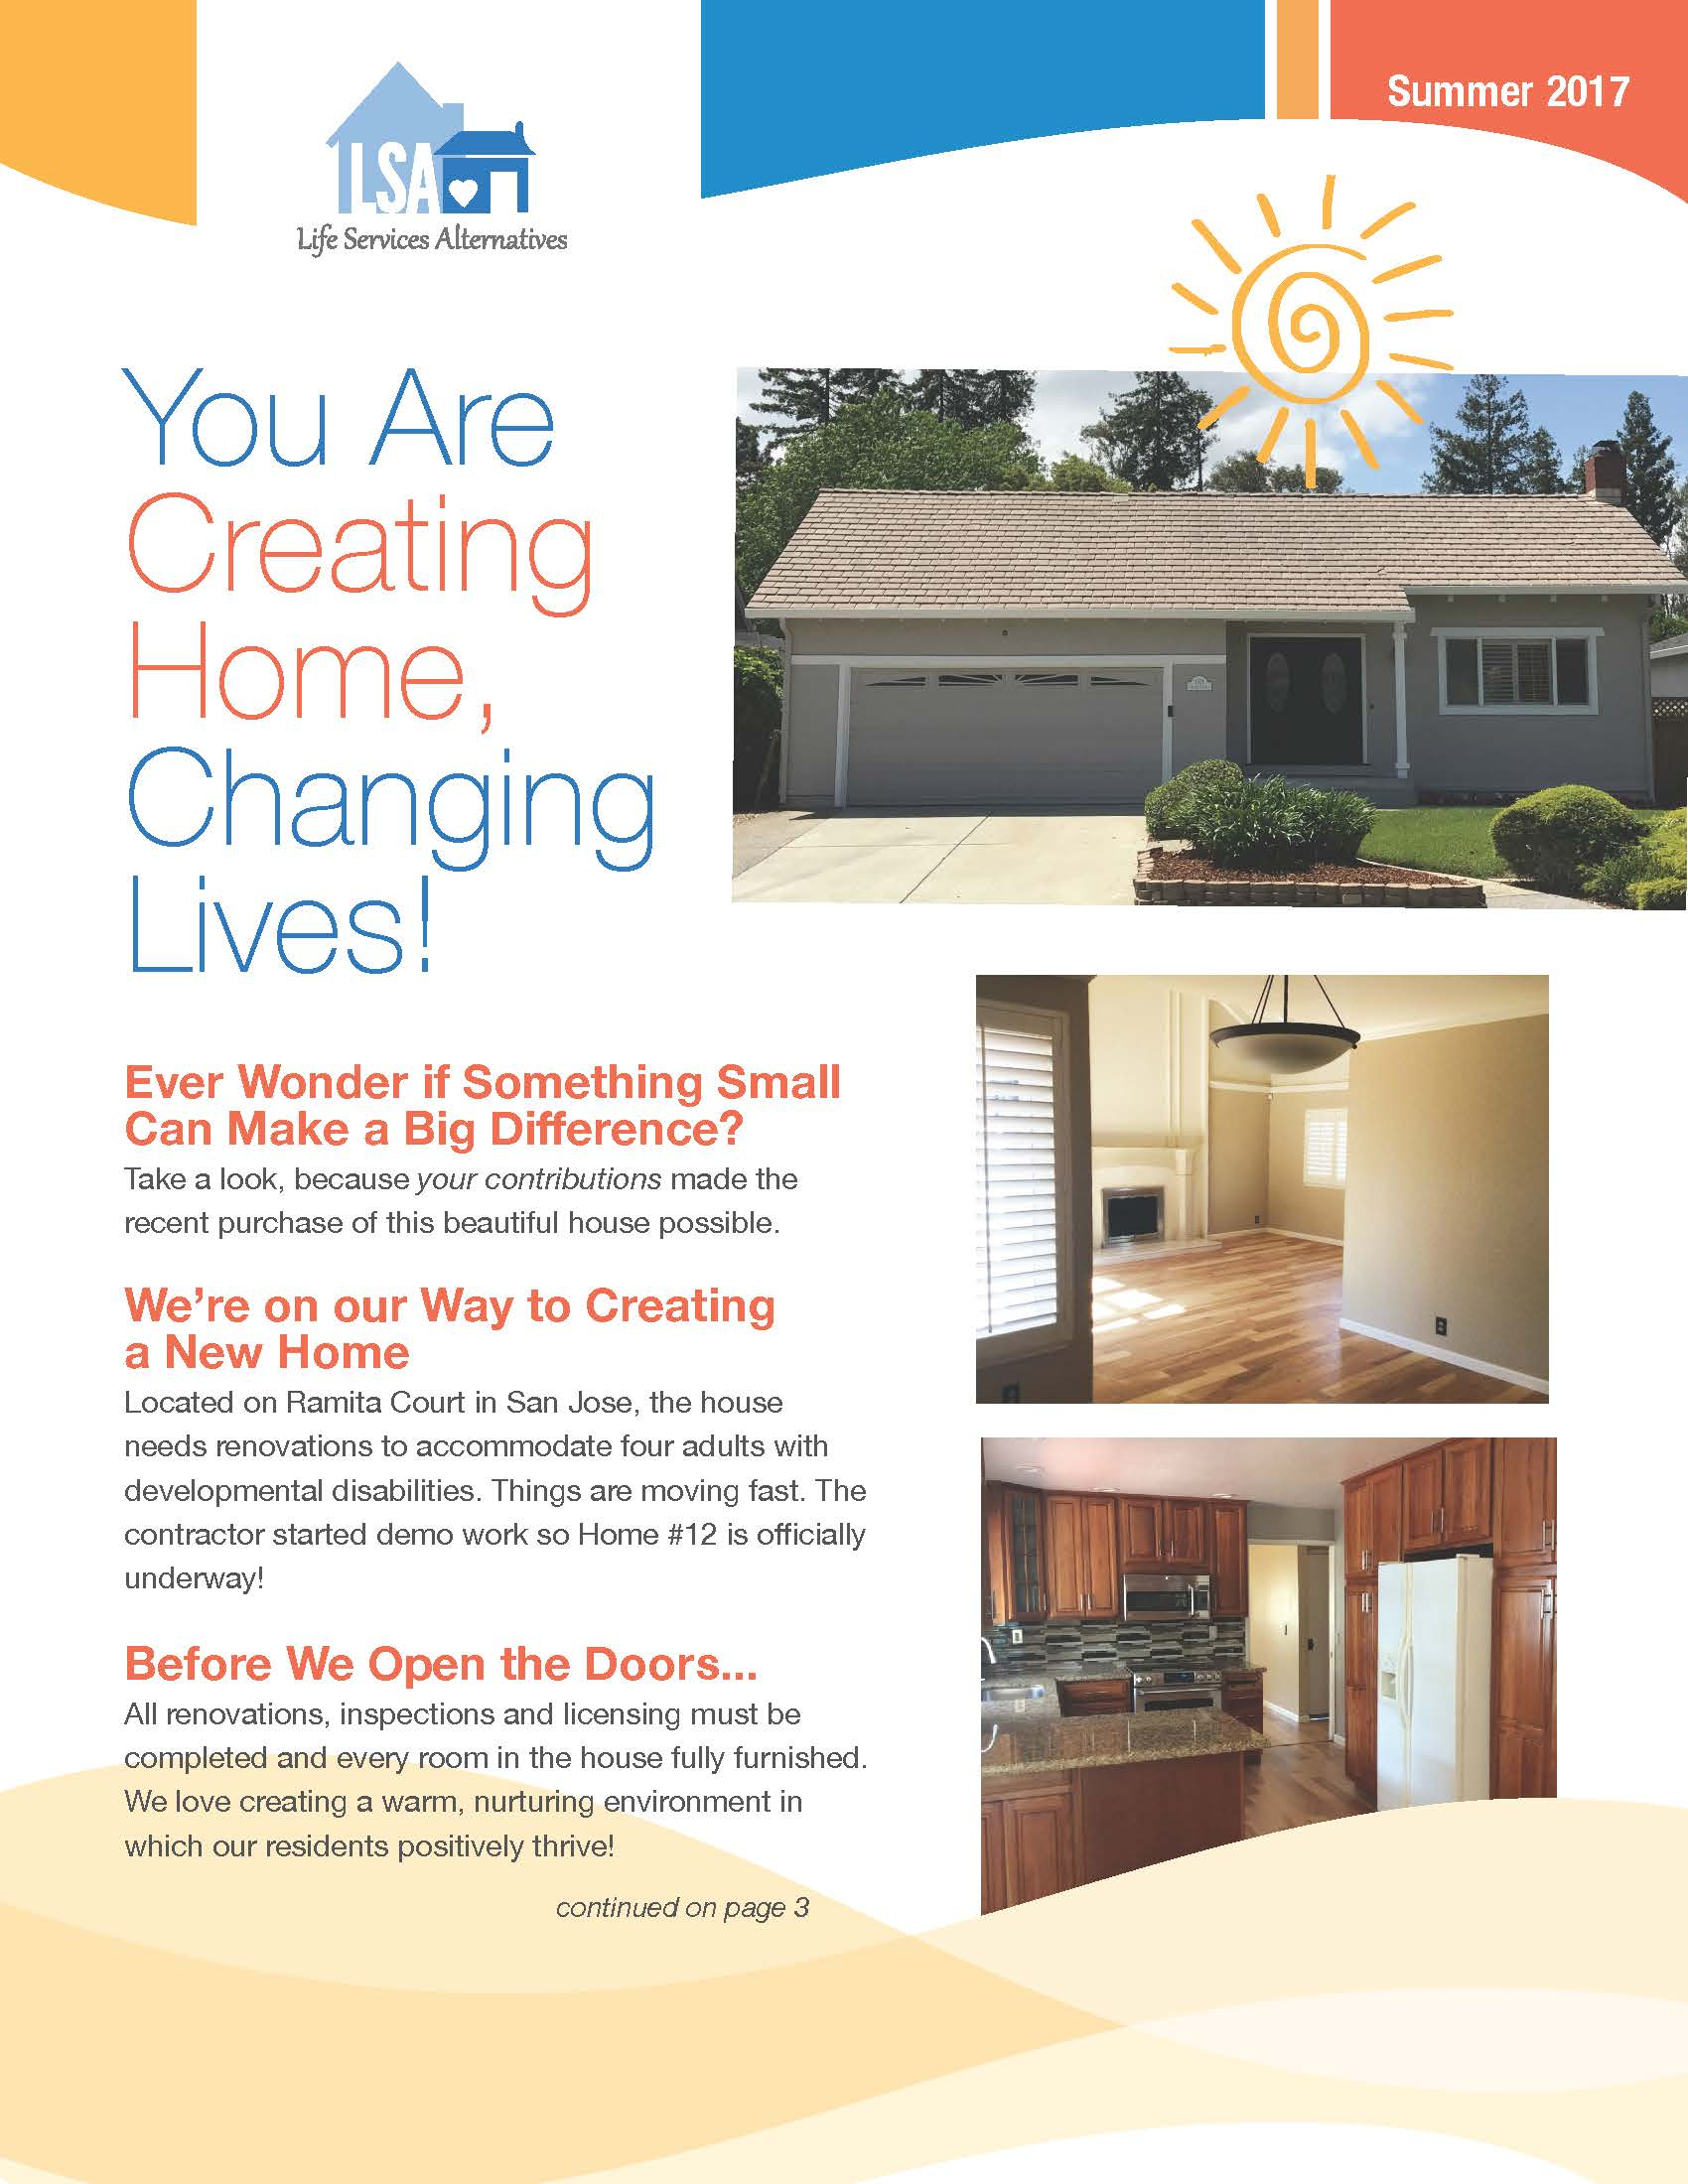 Life Services Alternatives   Summer 2017 Print Newsletter